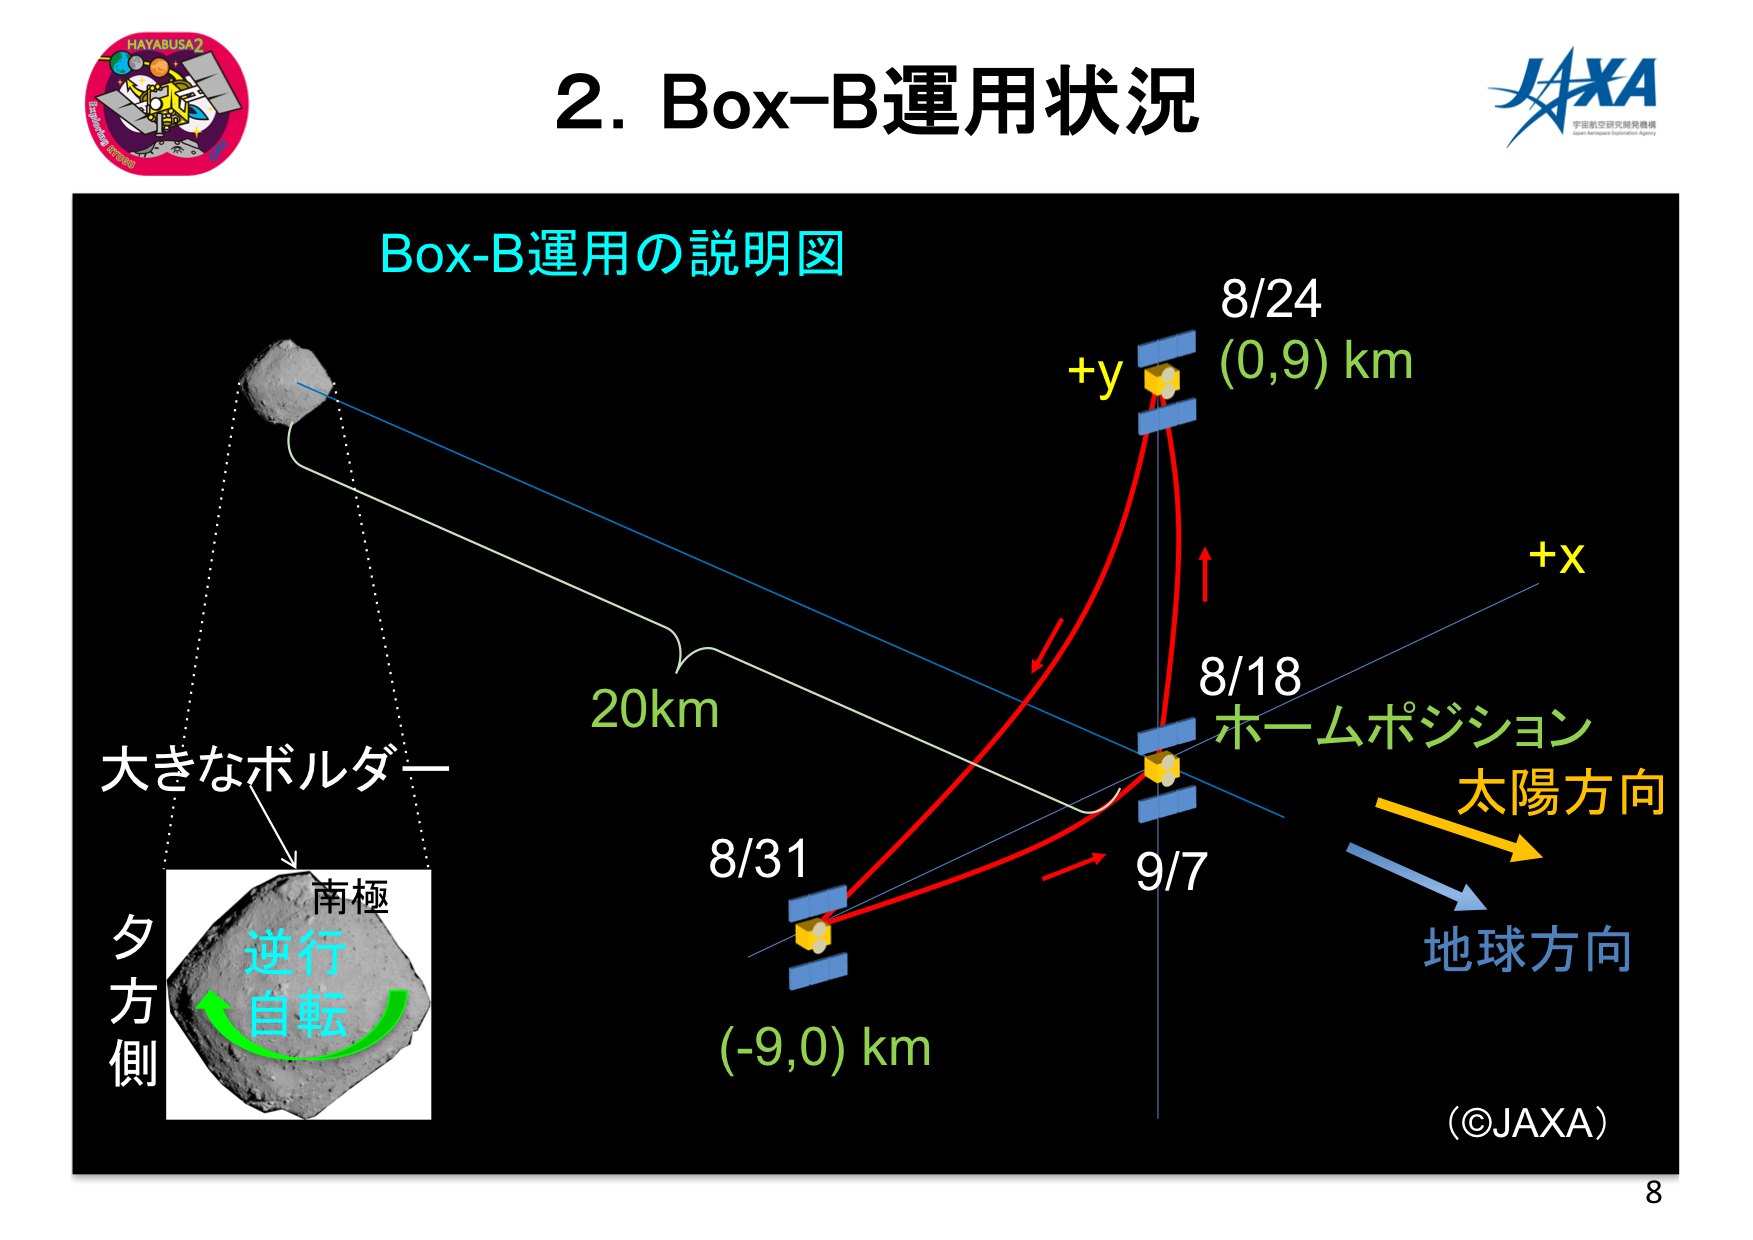 f:id:Imamura:20180905231940p:plain